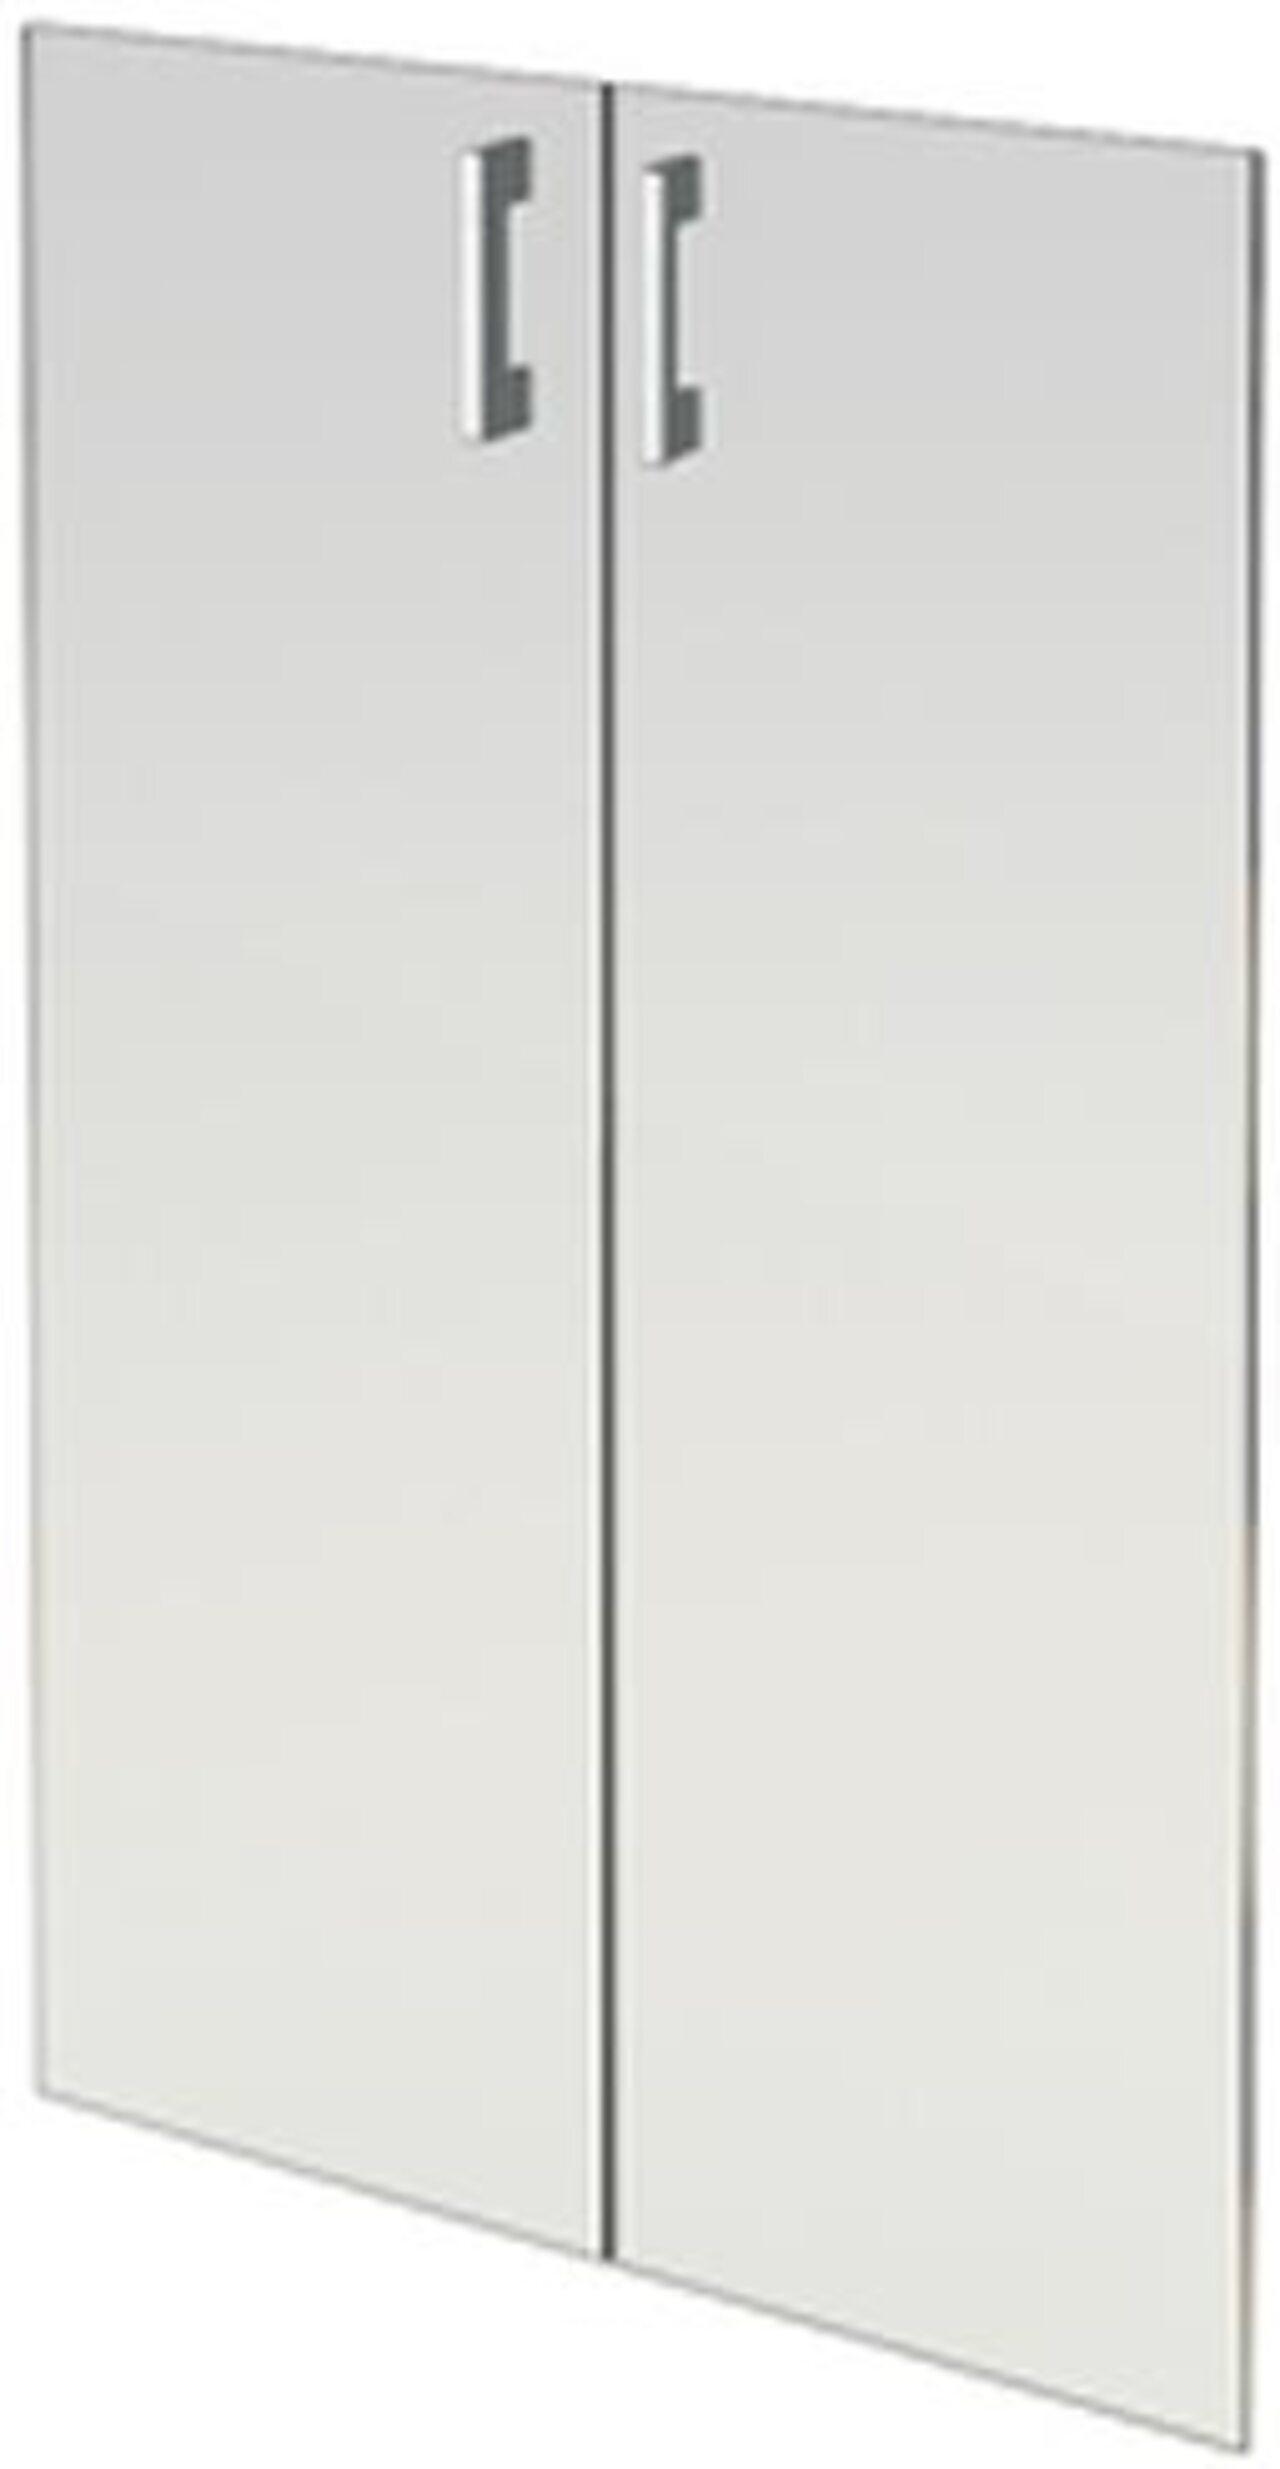 Комплект стеклянных дверей  Арго 71x1x112 - фото 1